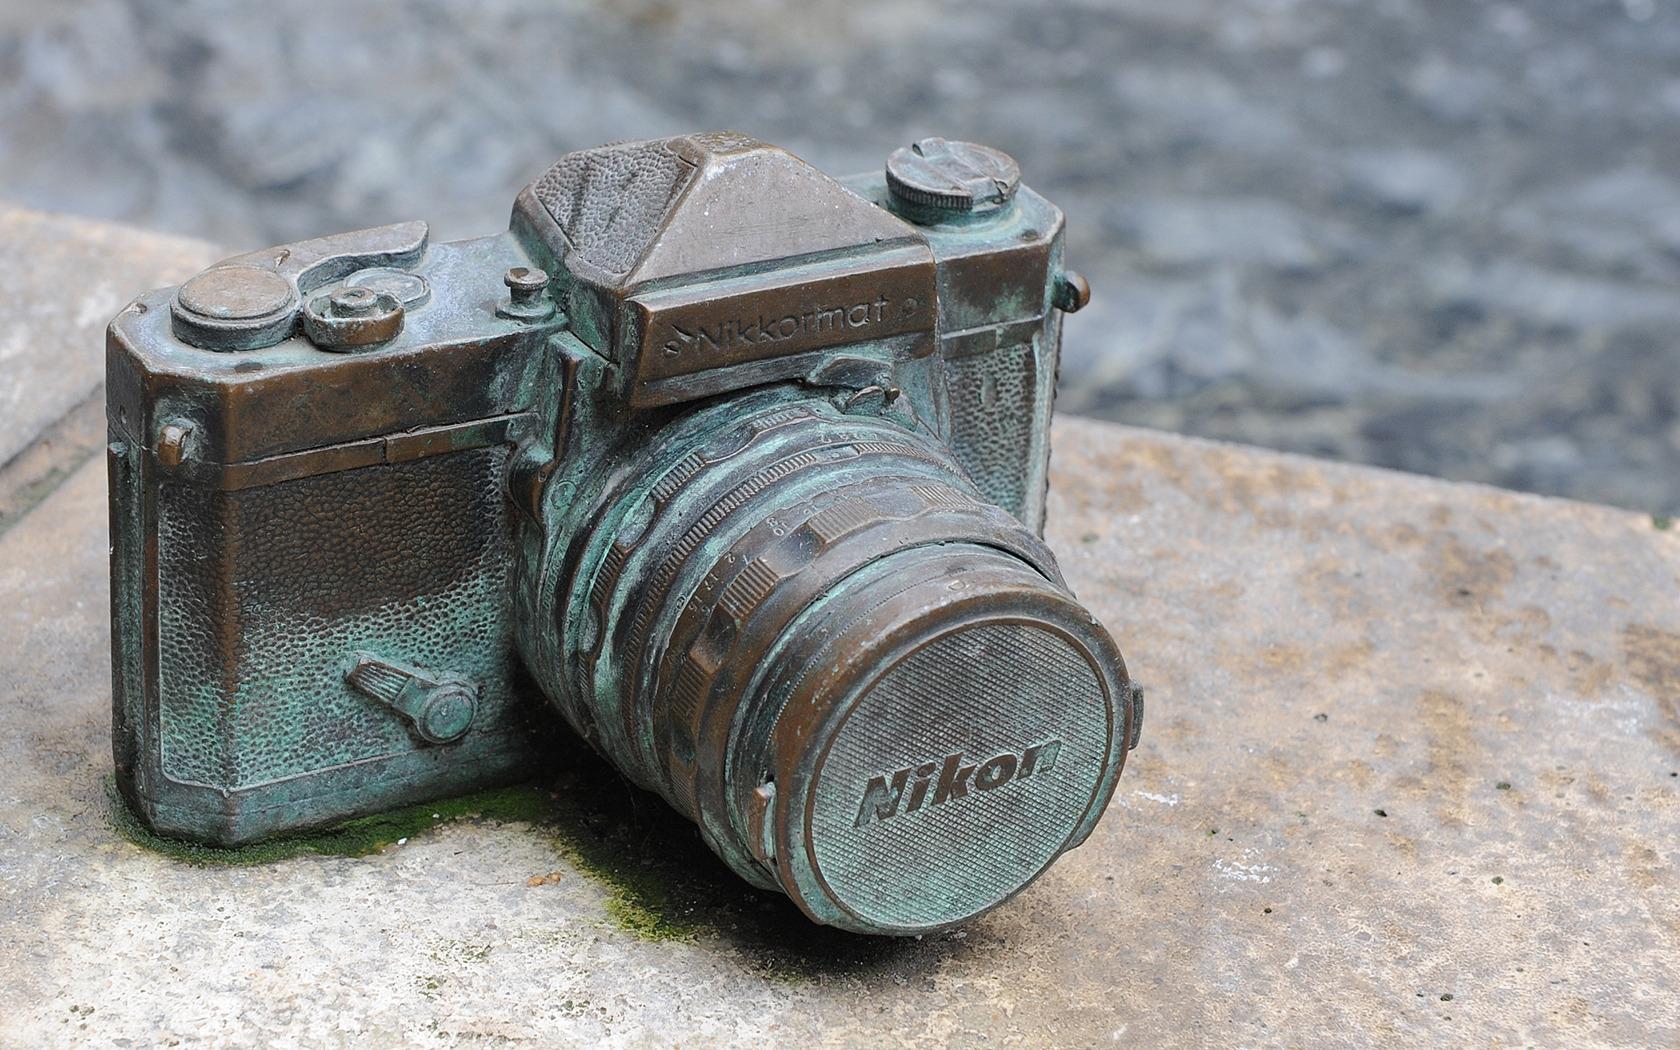 Фотоаппарат Nikon старый  № 3624410 бесплатно